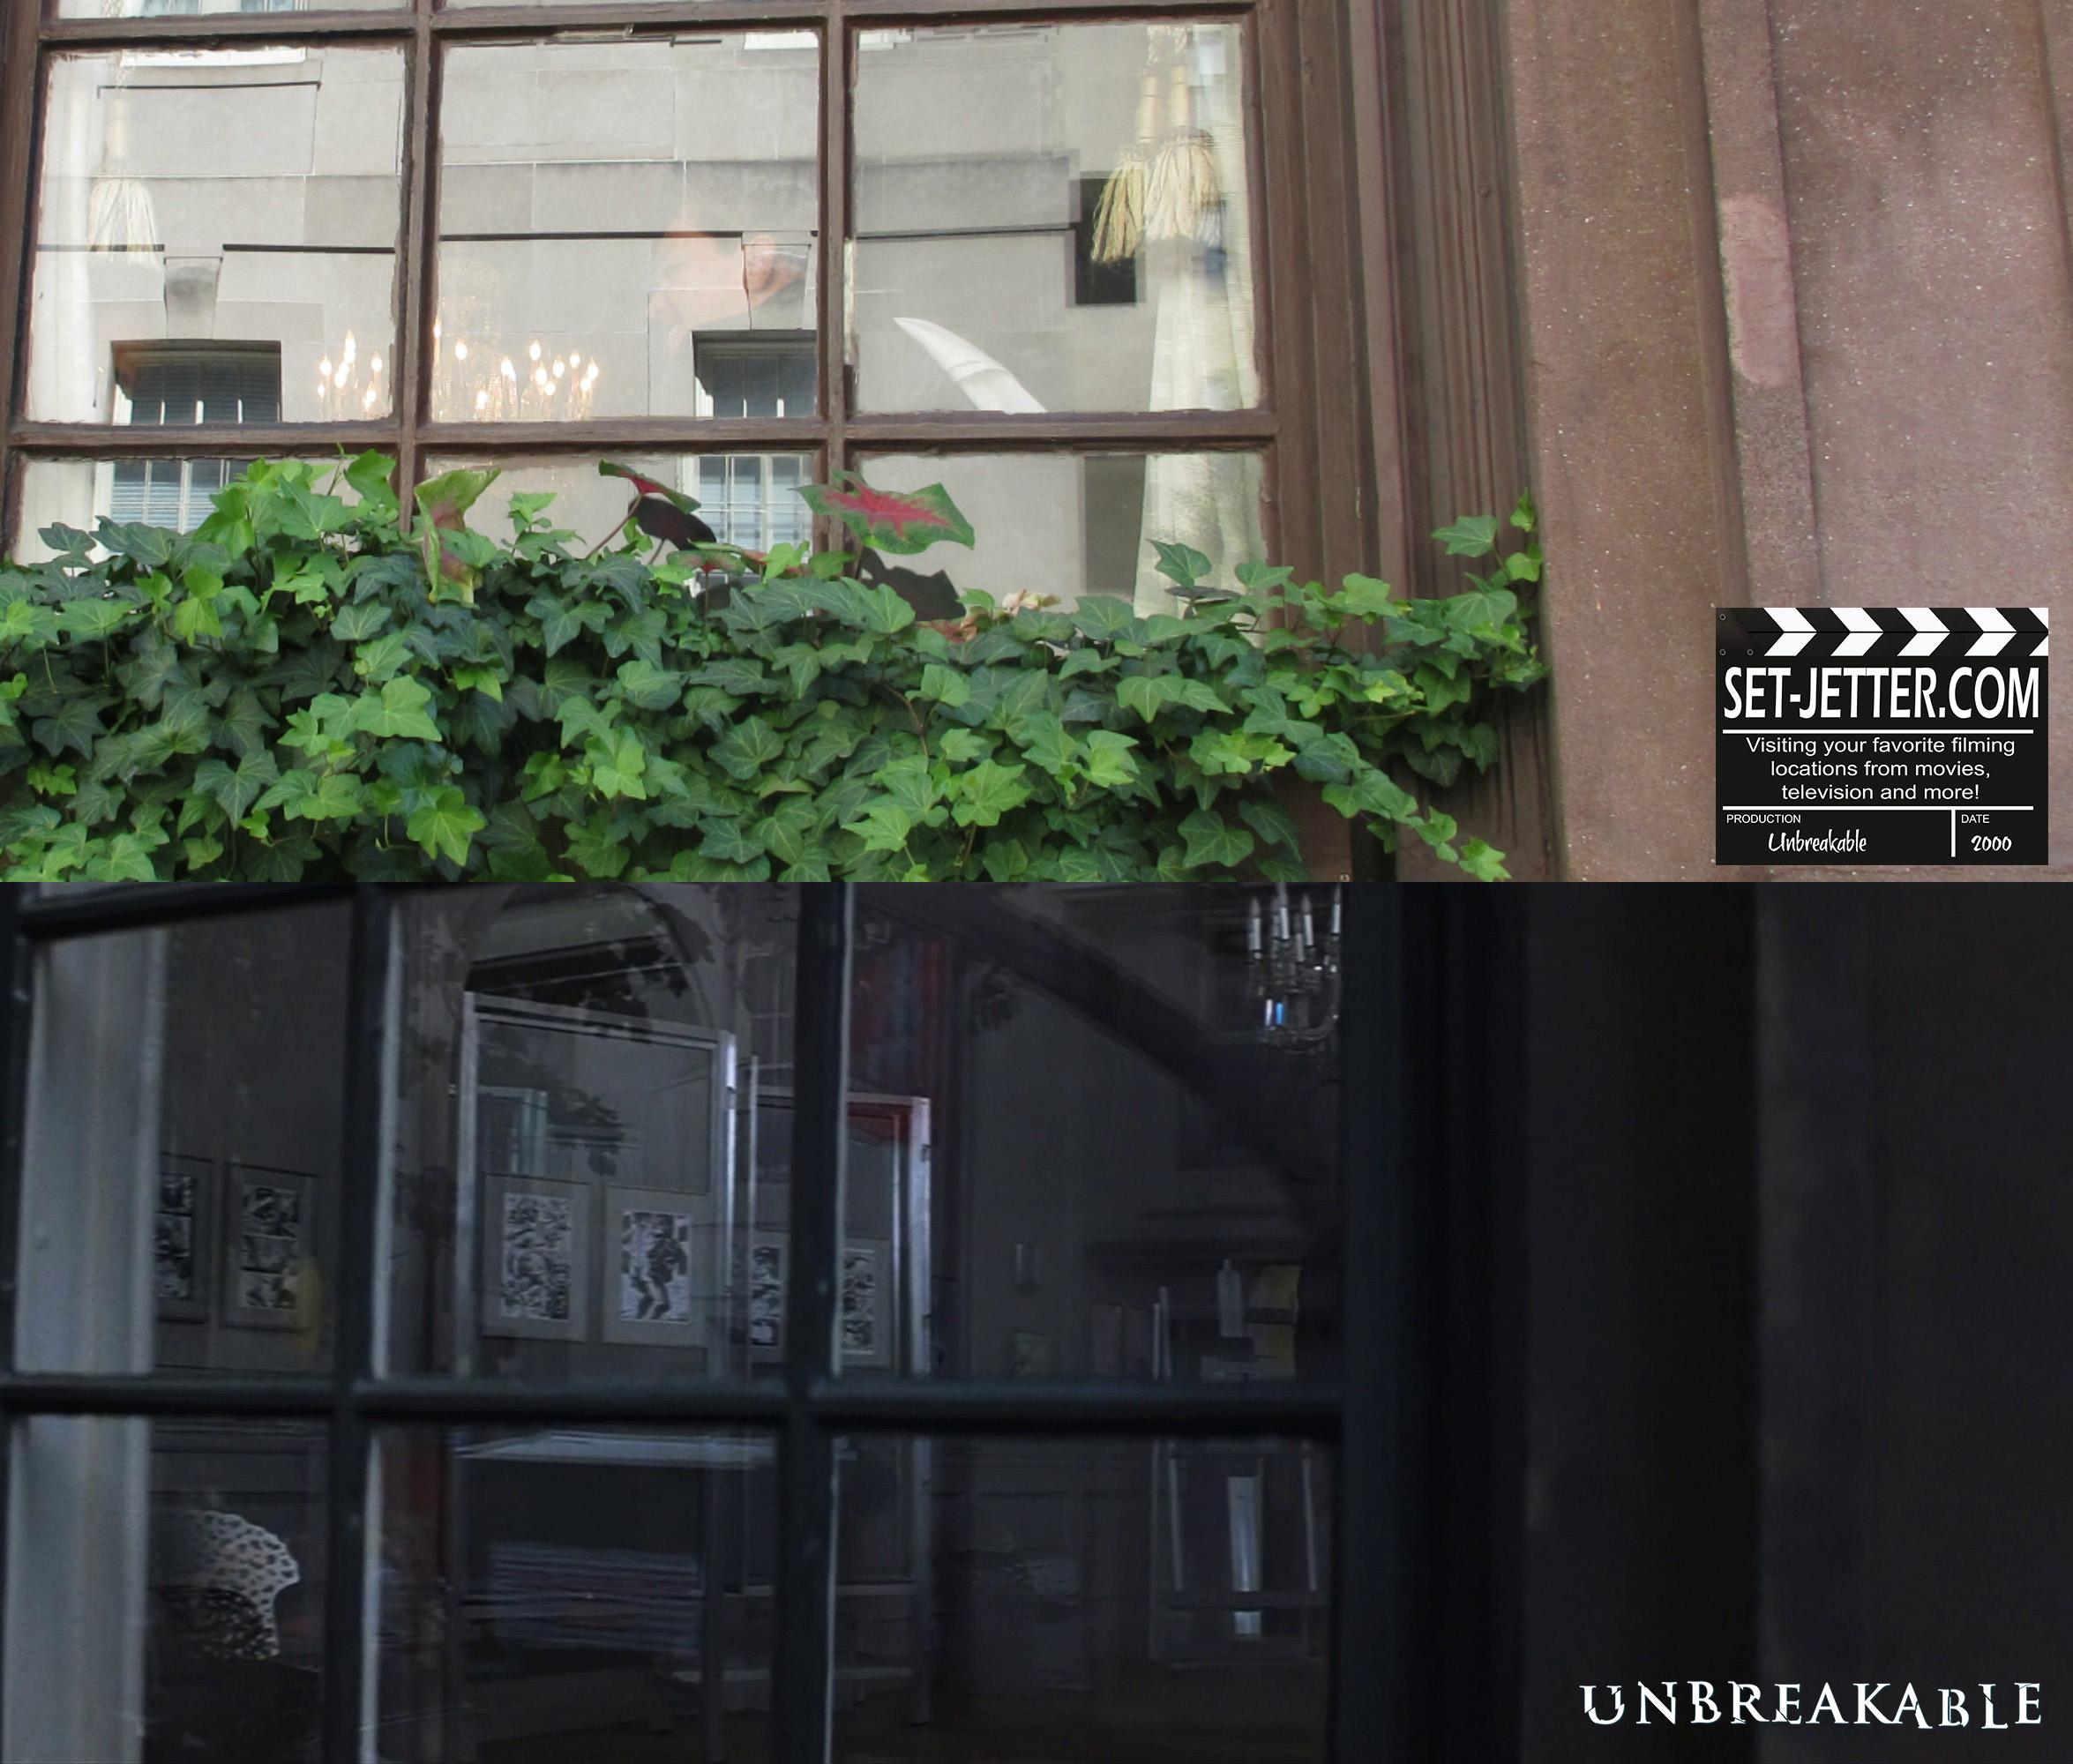 Unbreakable 016.jpg